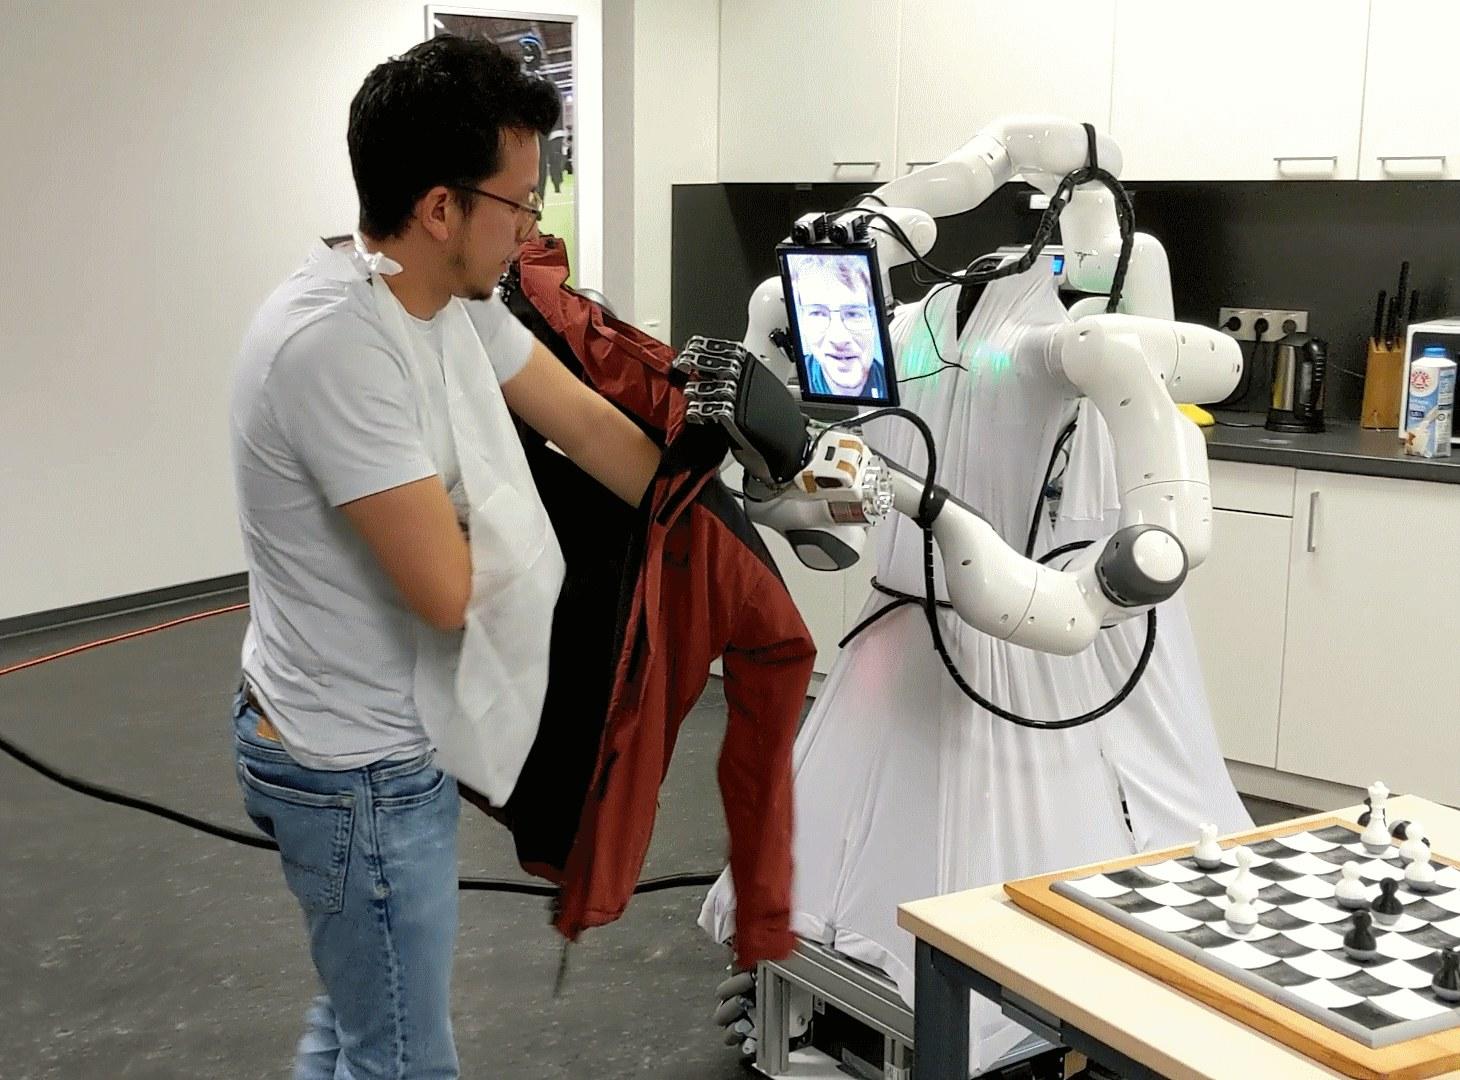 An assistance robot from the University of Bonn